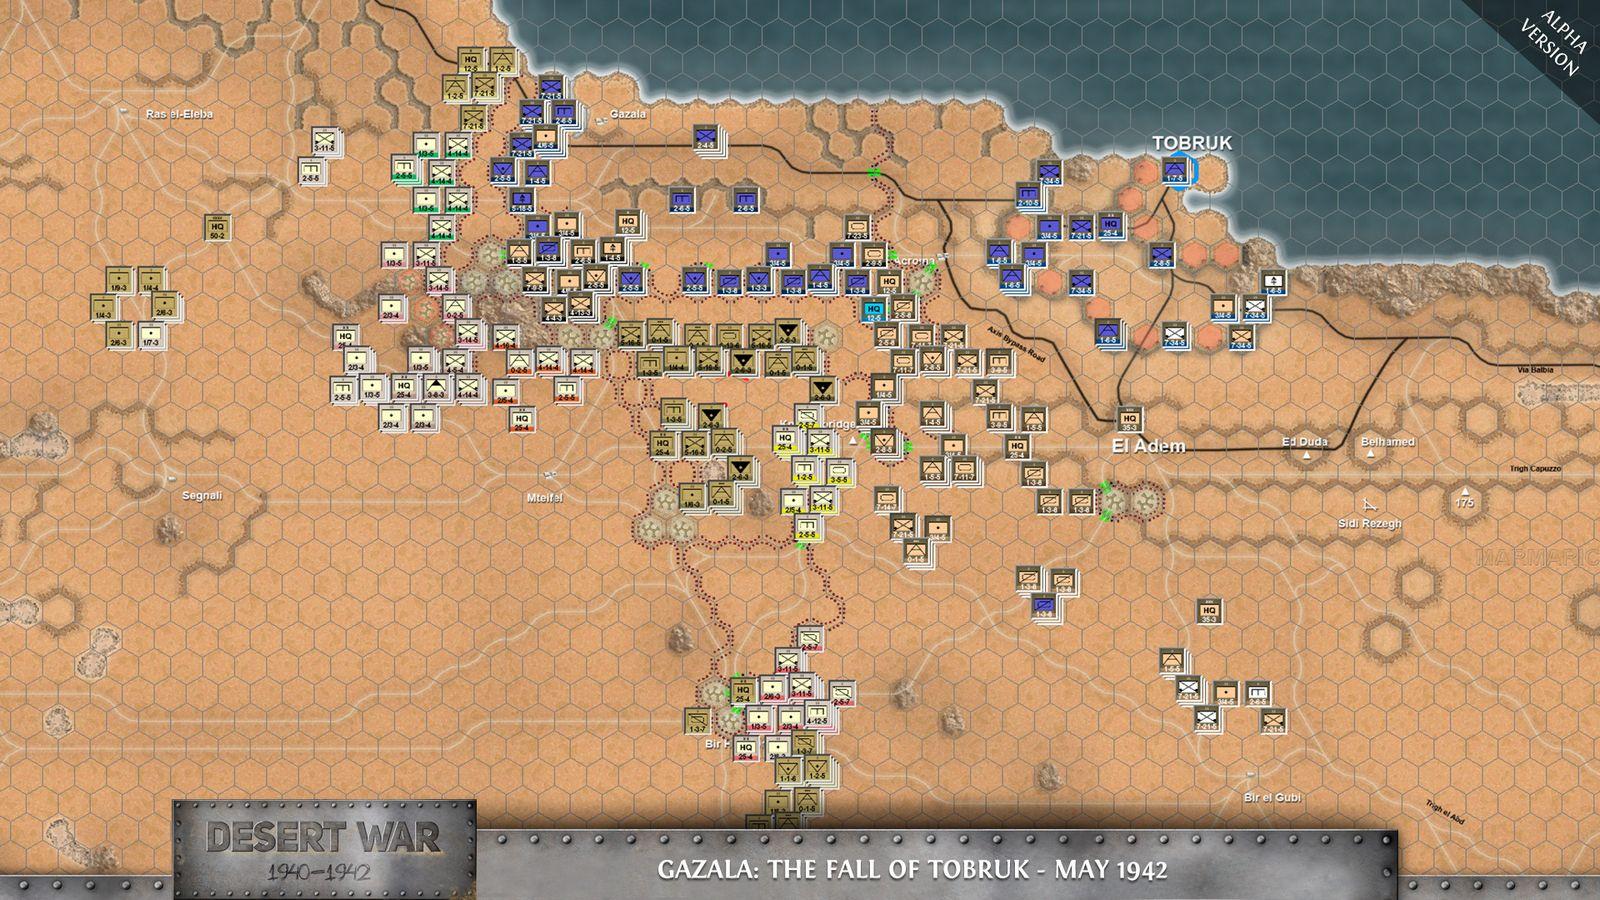 desert-war-40-42-0717-10-Gazala_The_Fall_of_Tobruk_May_1942